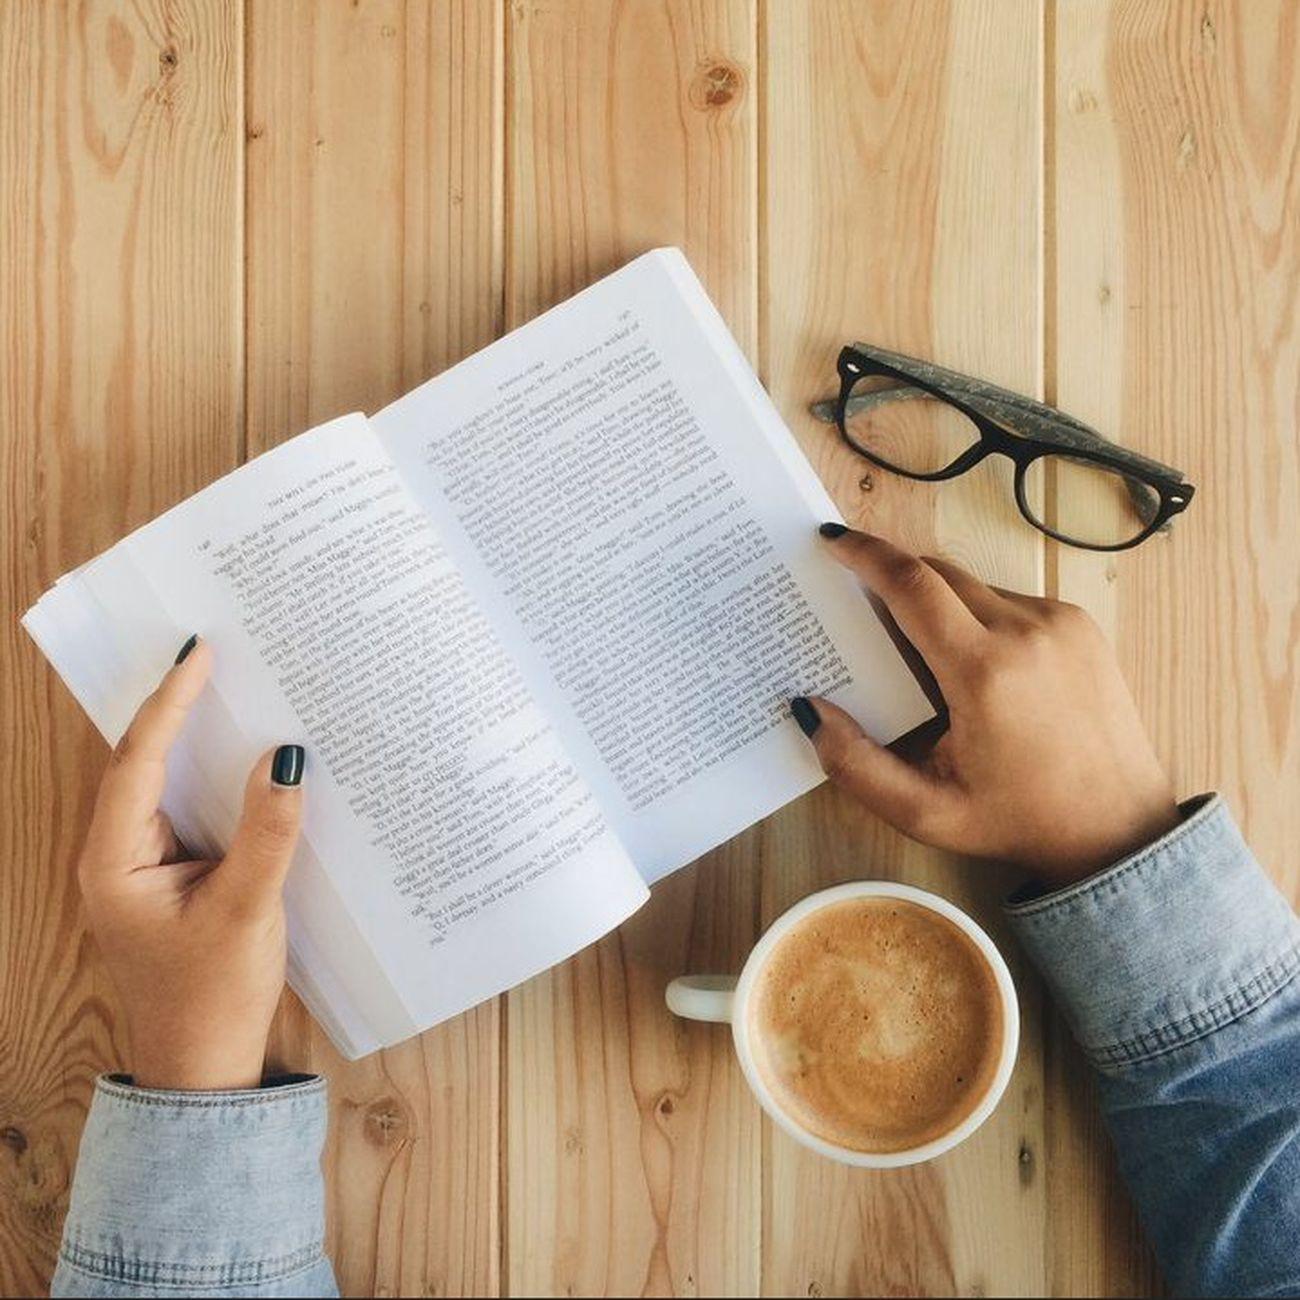 Follow @Co0oCo0o0 for more grat pics Book Reading Reading A Book Coffee EyeEm Best Shots Popular Photos Photography ShoutOut Shoutoutvlog EyeEm Best Edits